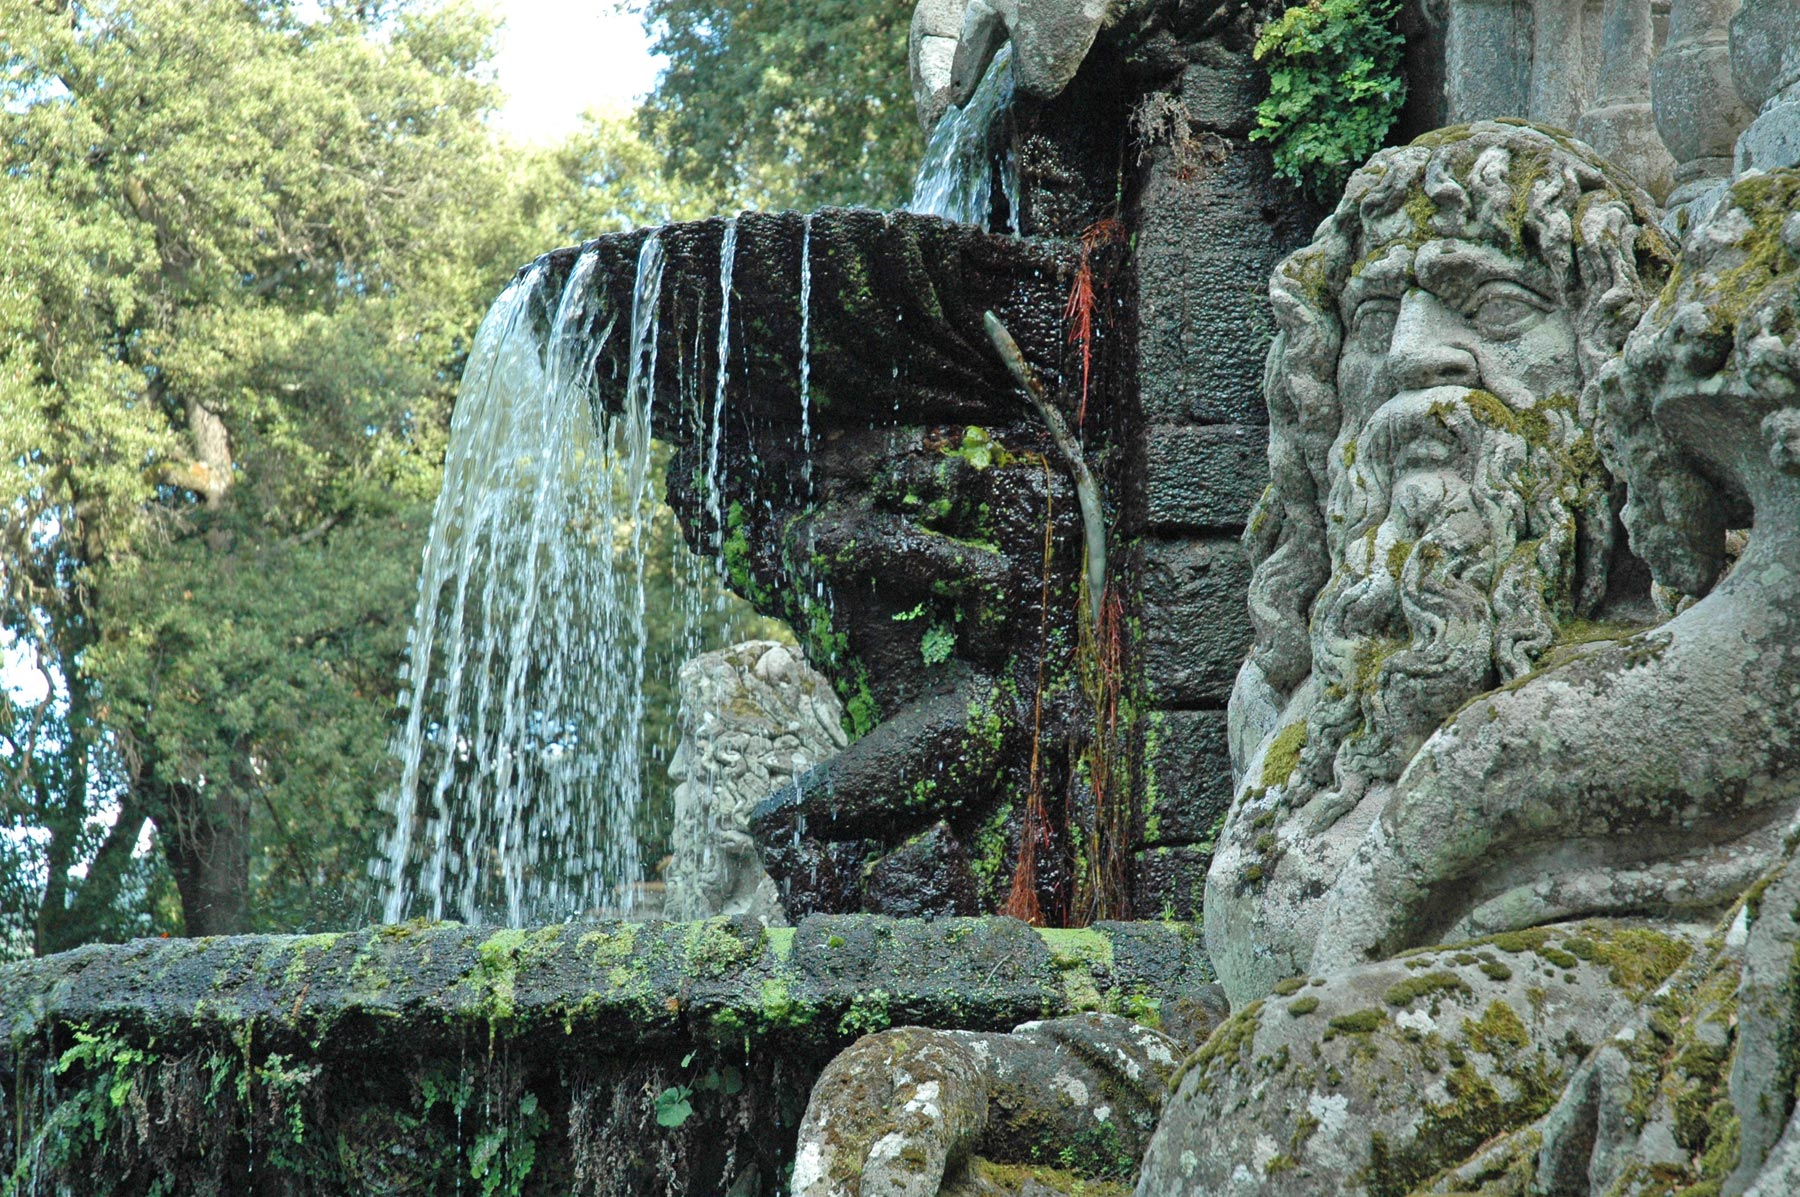 Villa Lante Fontana dei Giganti